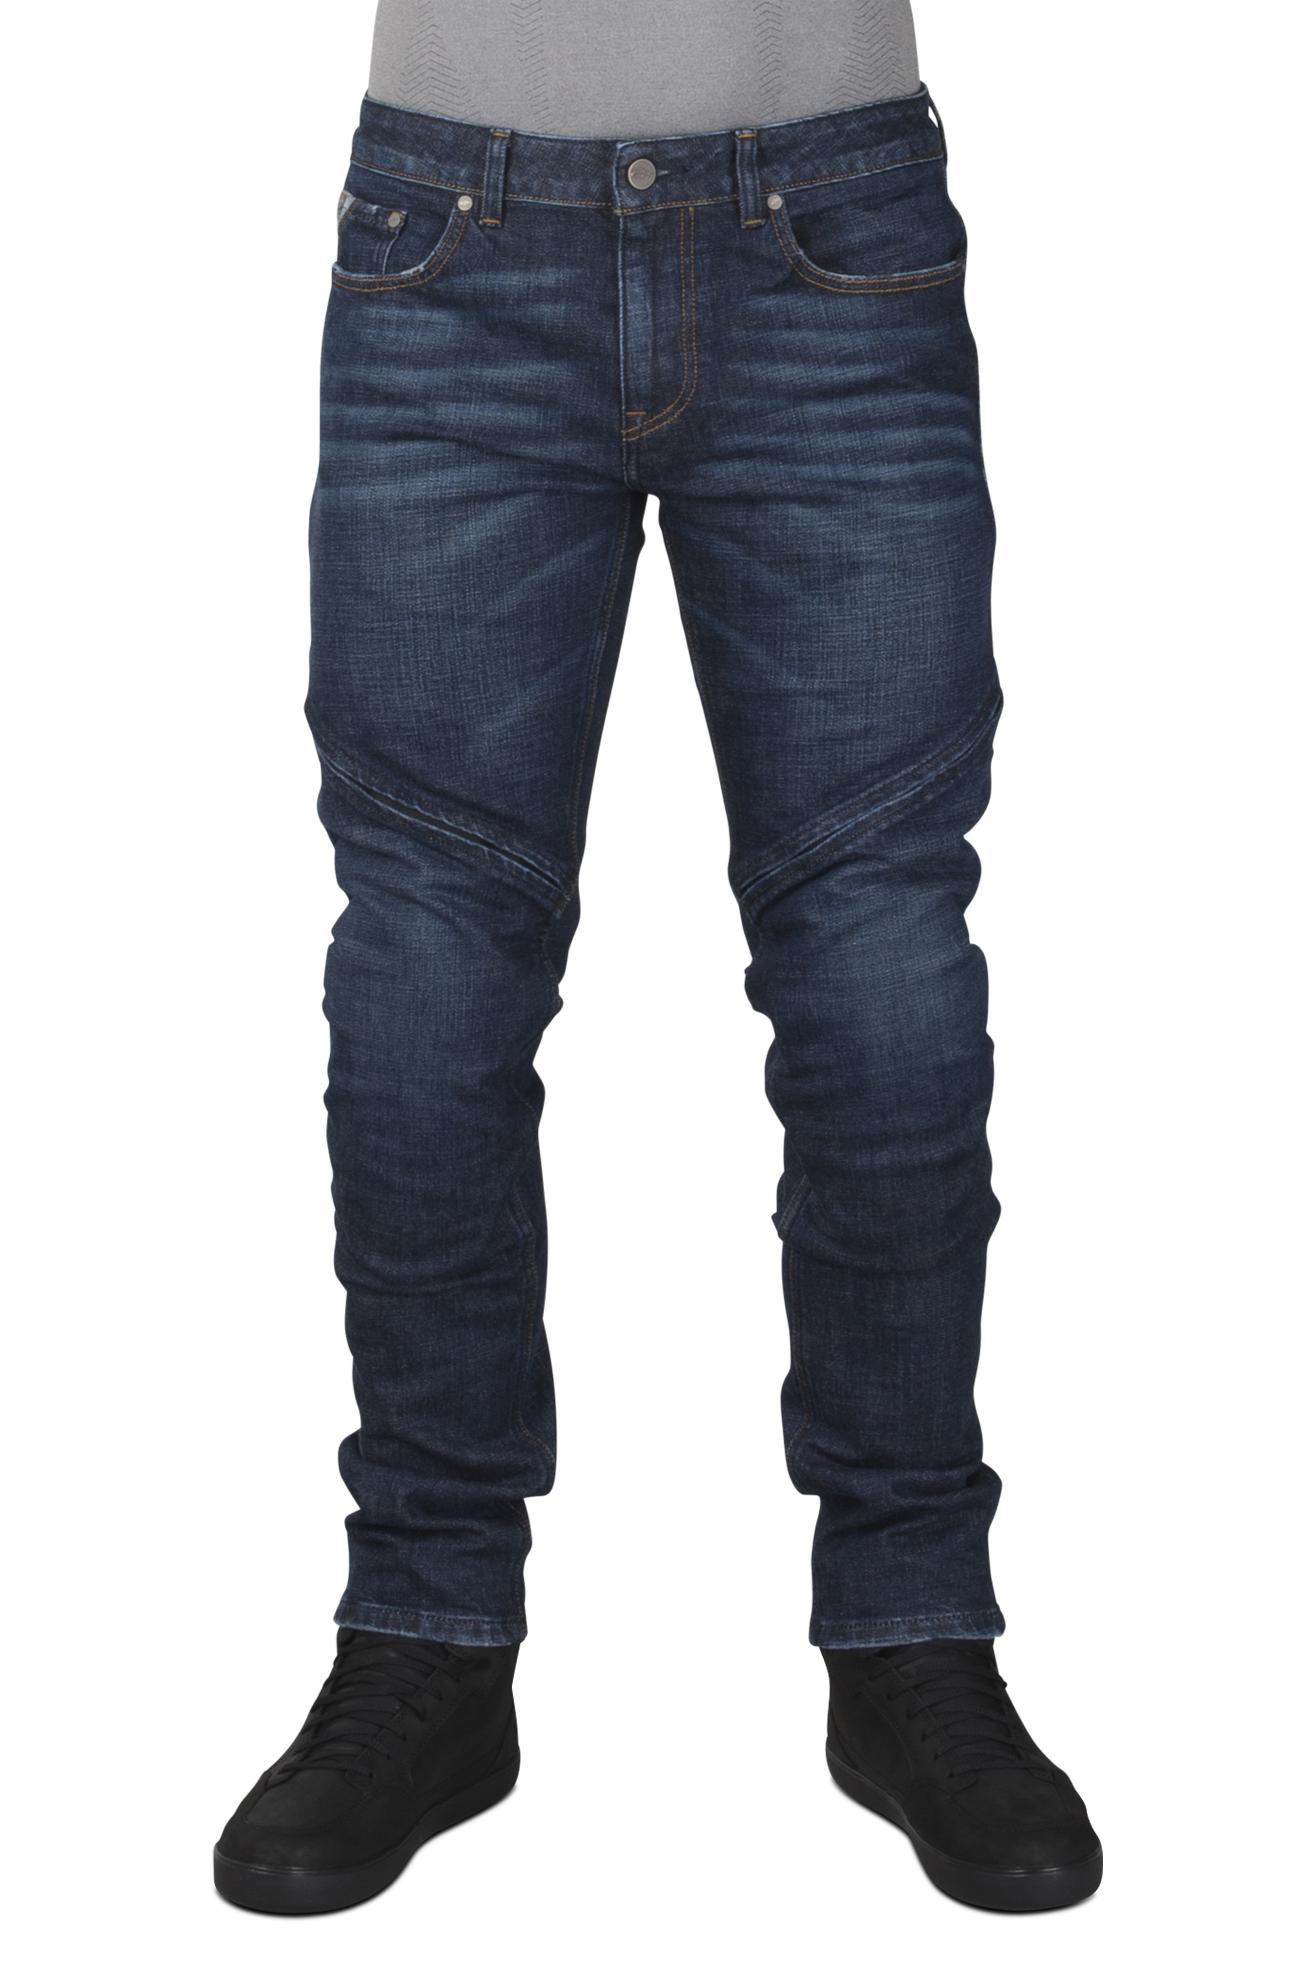 Alpinestars Pantalon Alpinestars Copper Out Jeans Dark 28